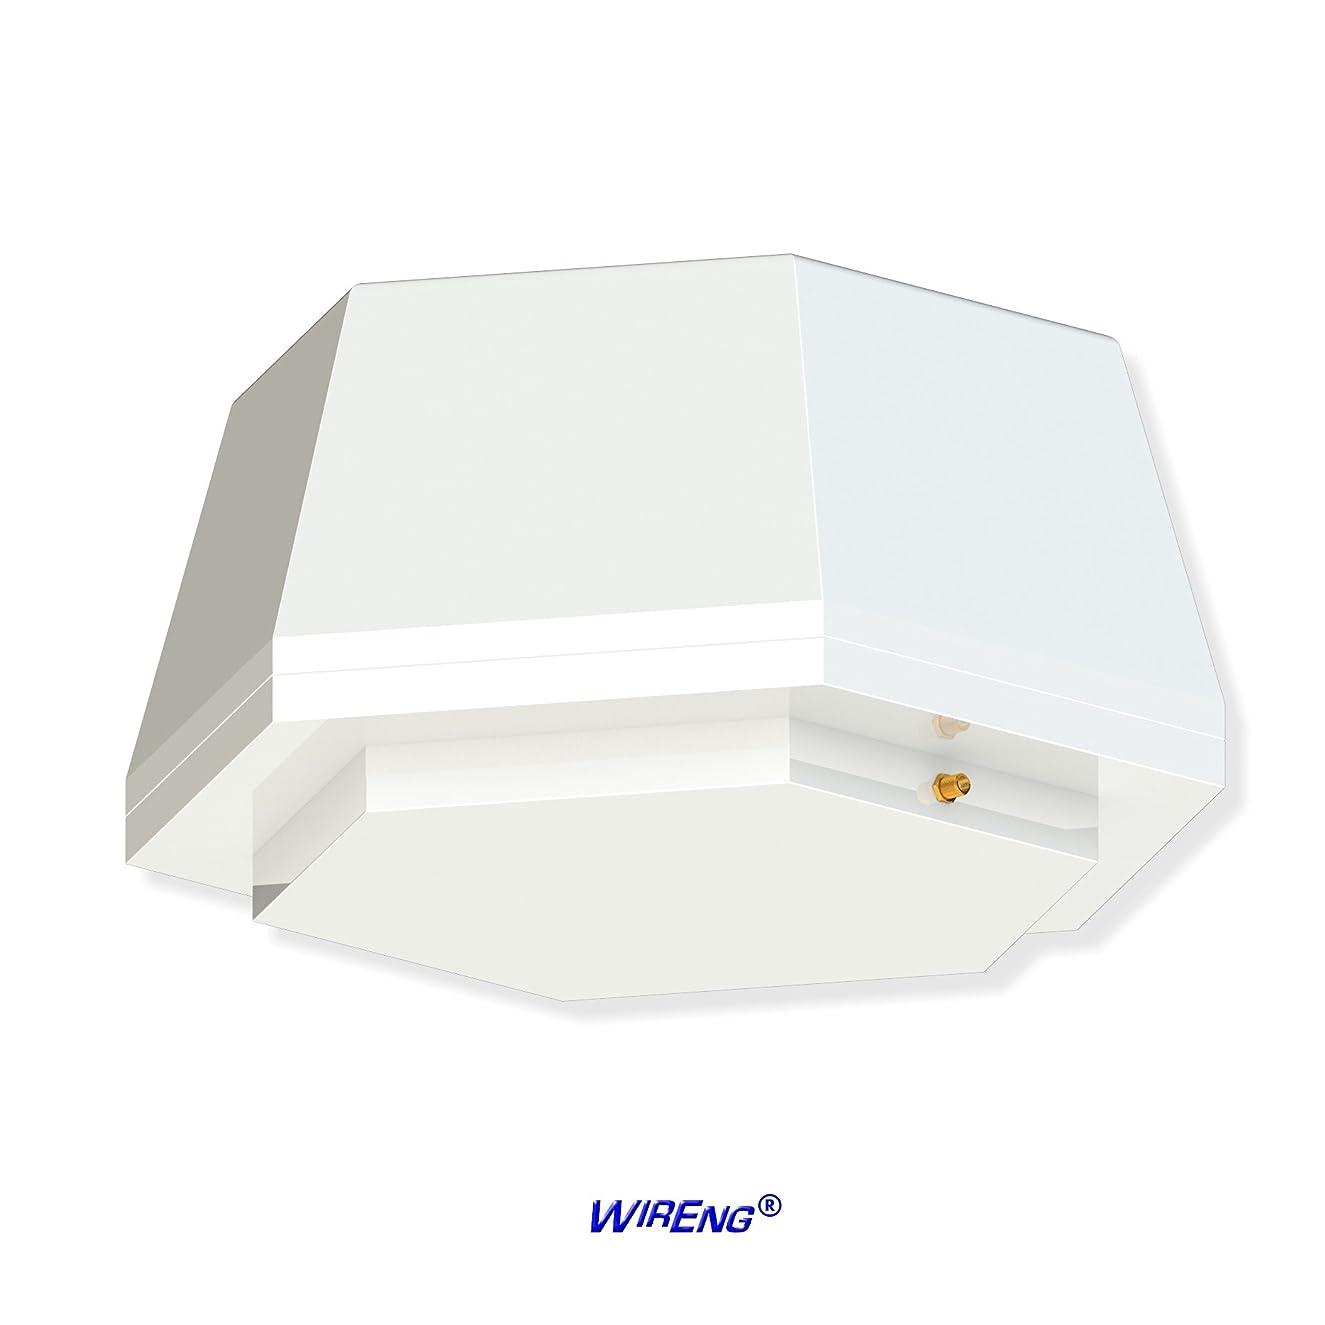 DeskAnt? Portable Antenna for Verizon U720 Modem Desktop Industrial Strength Inside/Indoor/Internal